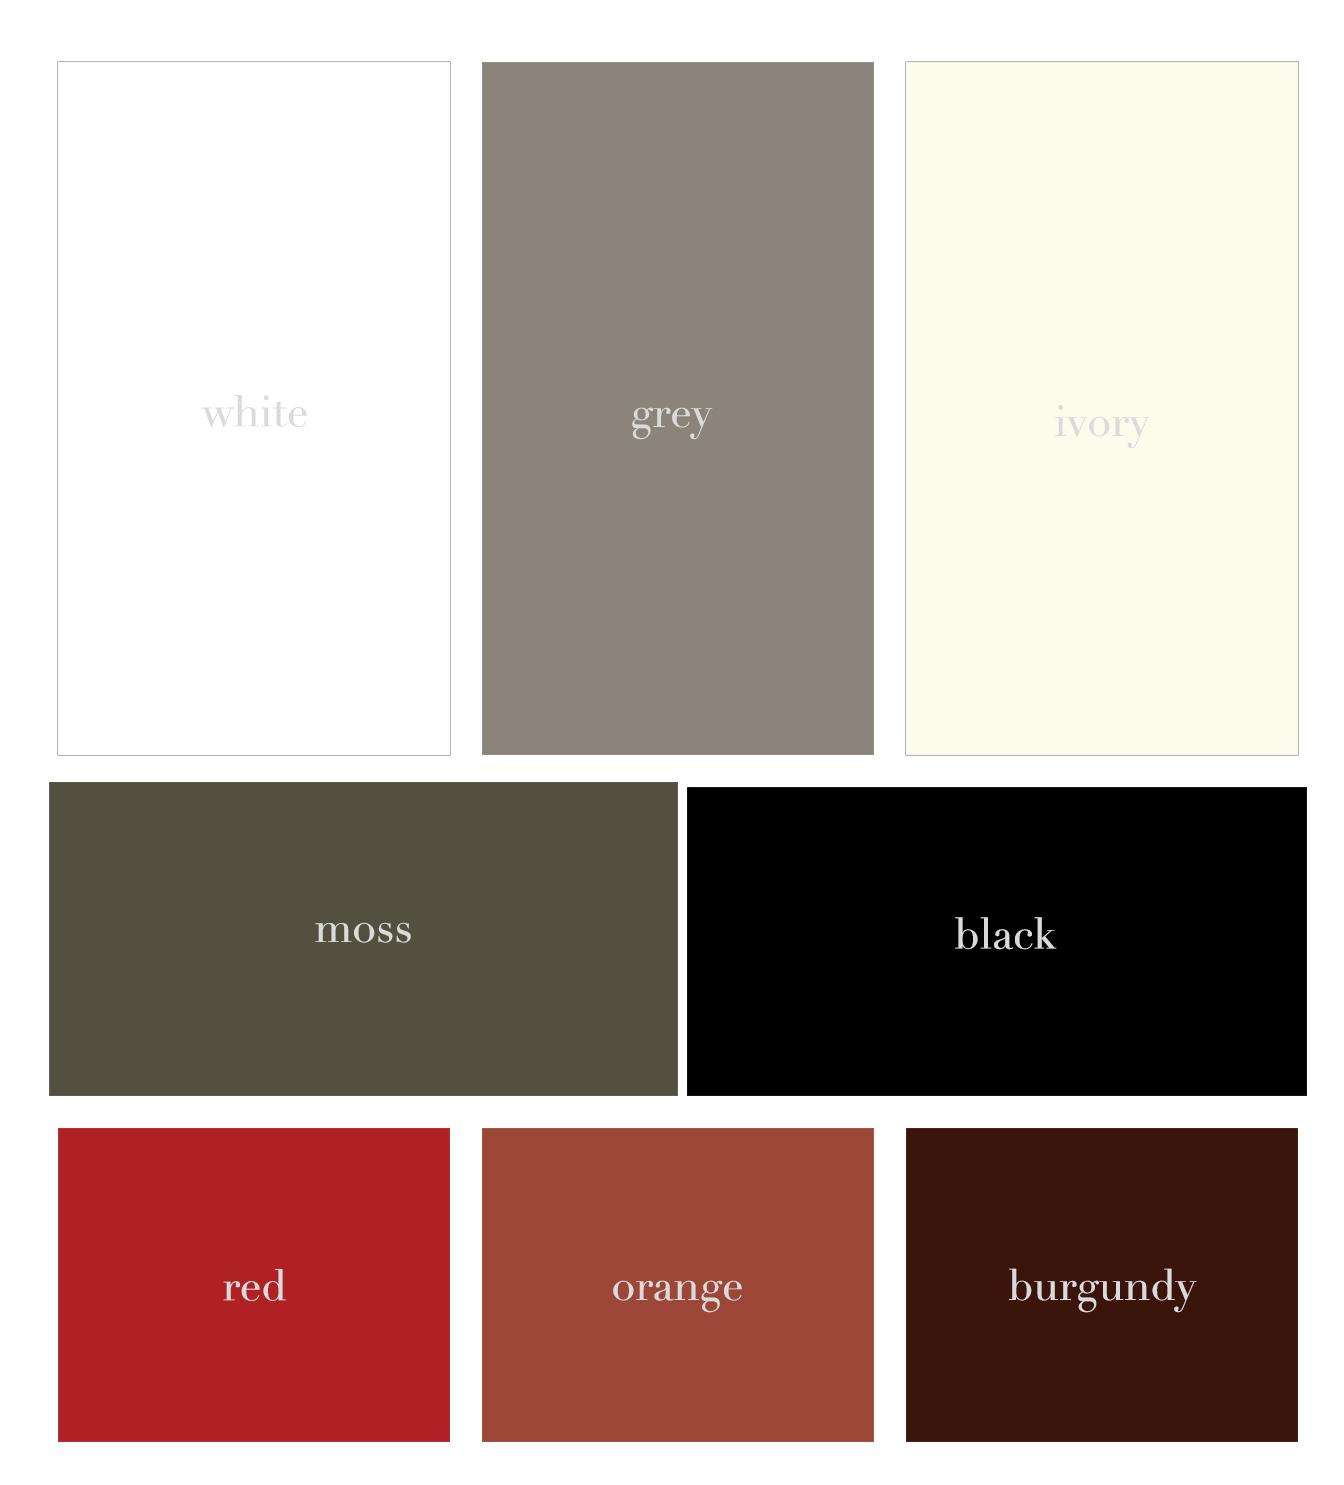 capsule_wardrobe_color_palette.jpg